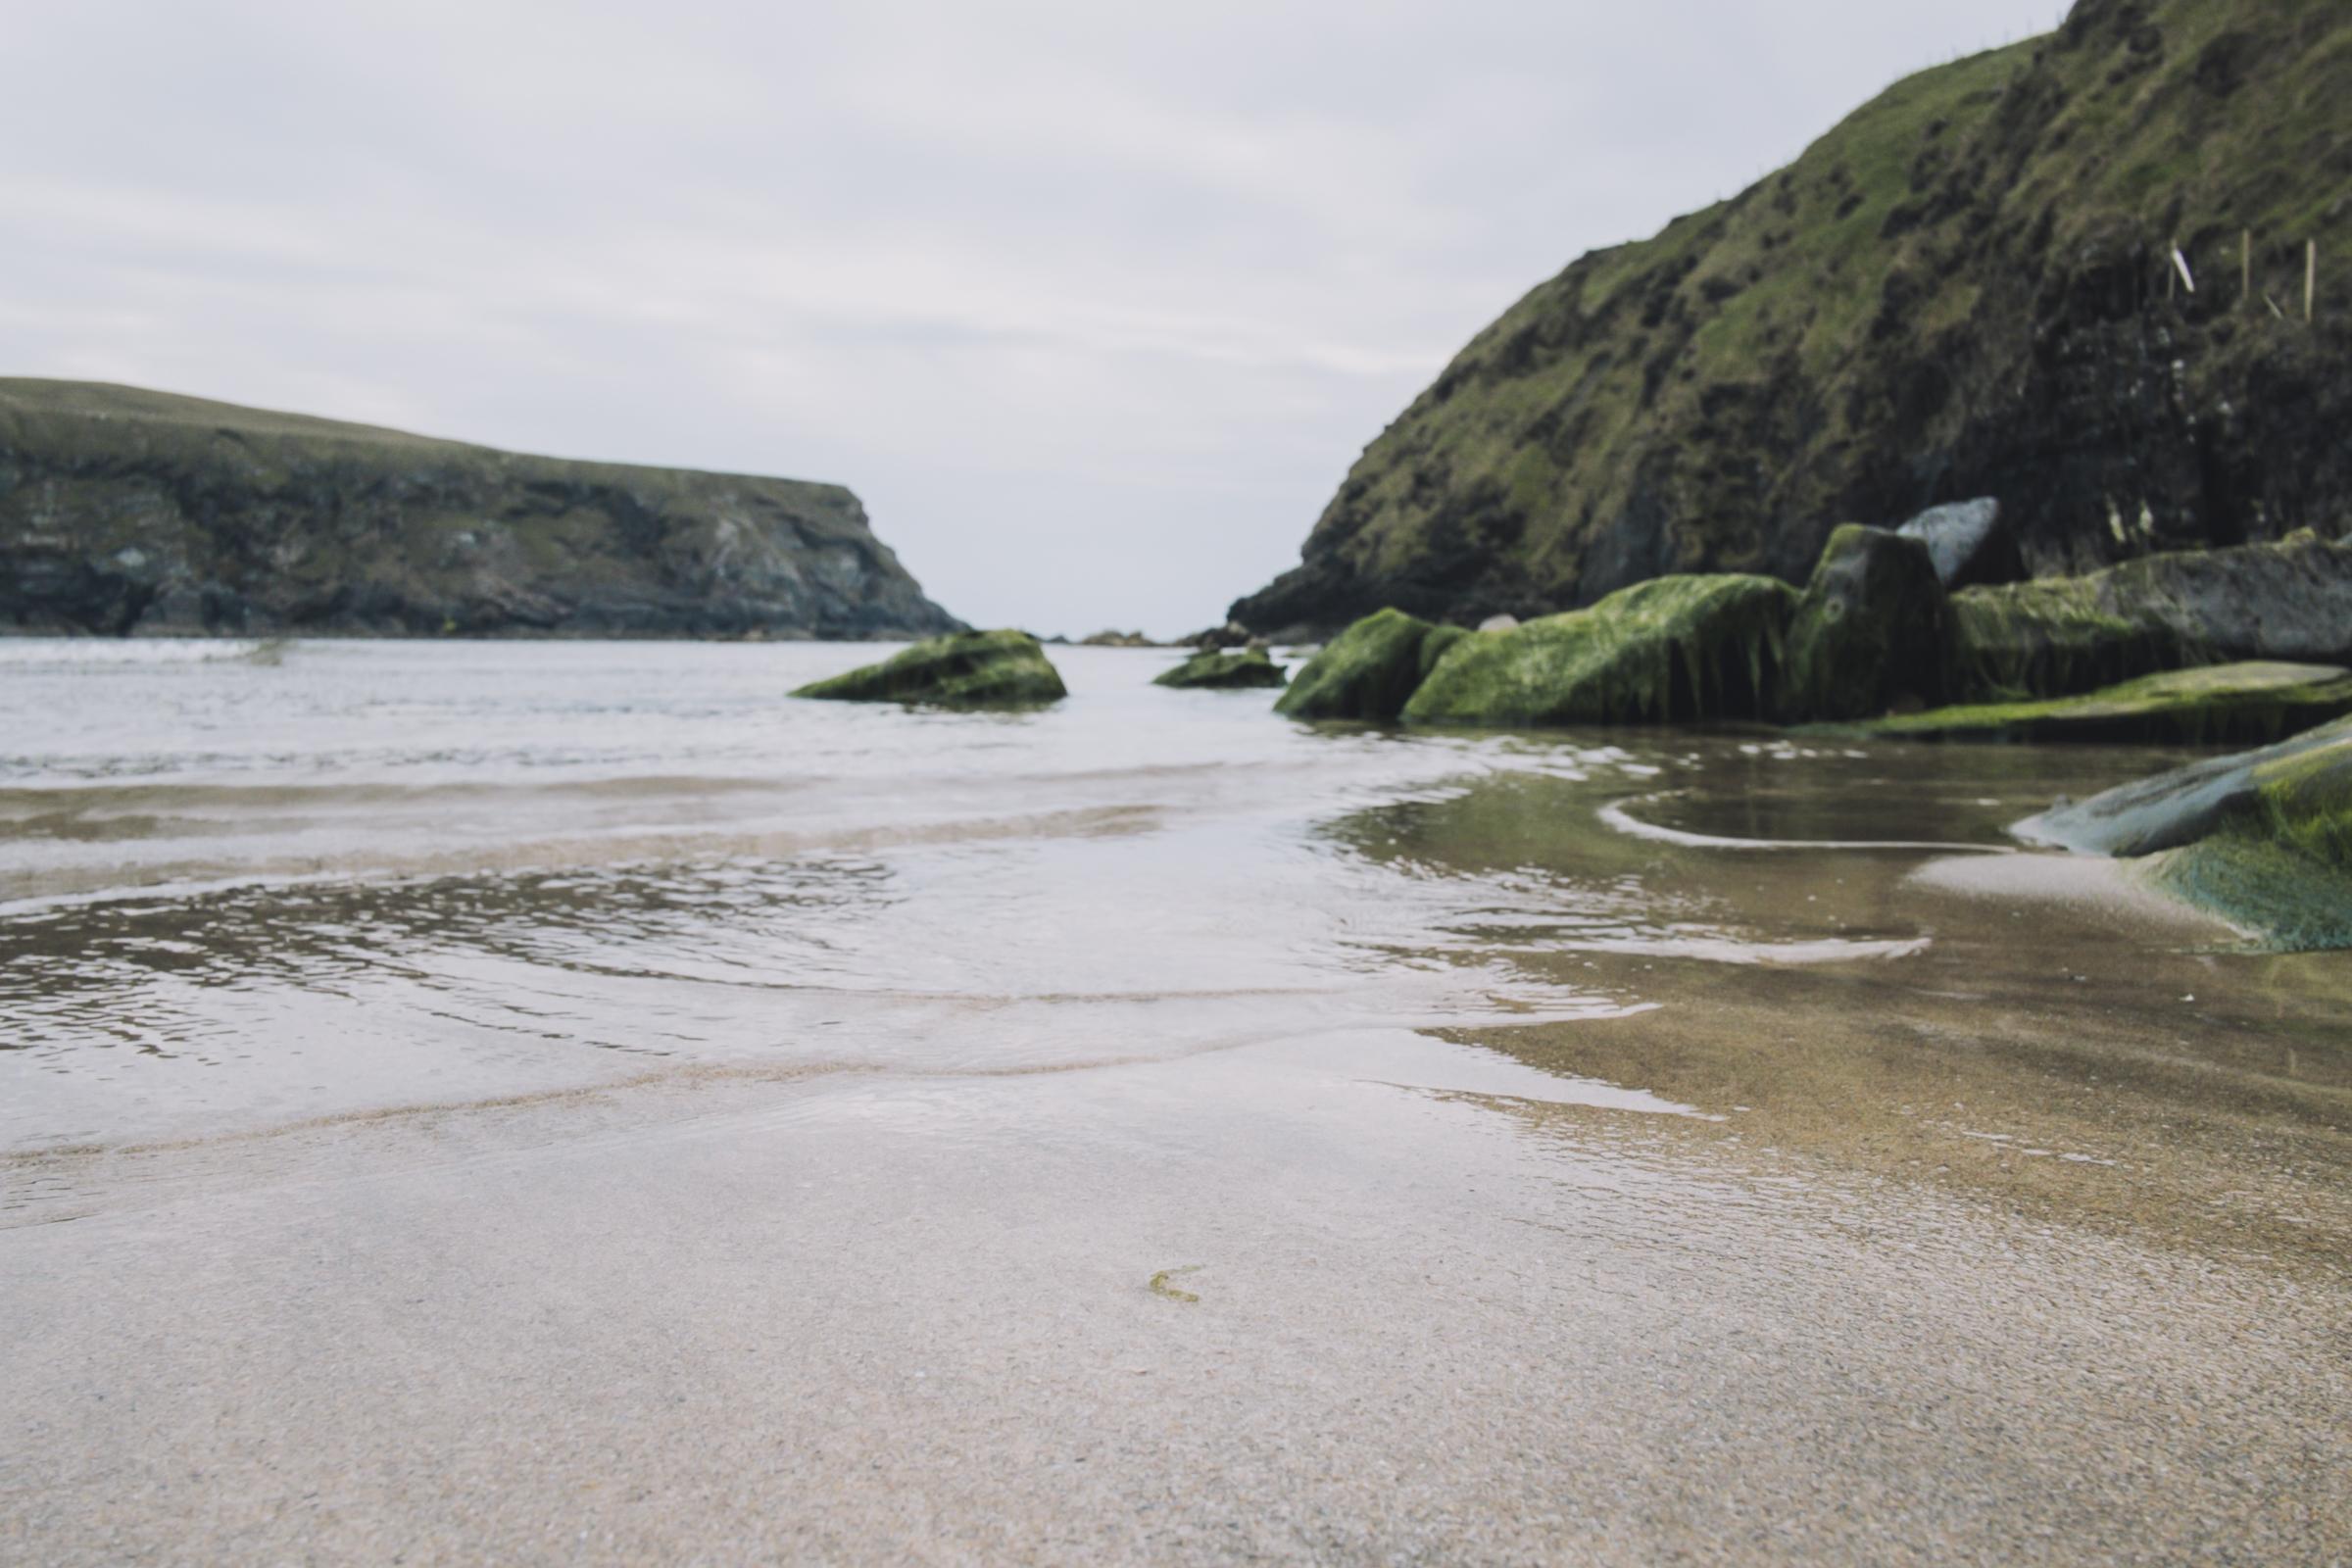 20150612-021-Ireland_Travel_Editorial.jpg